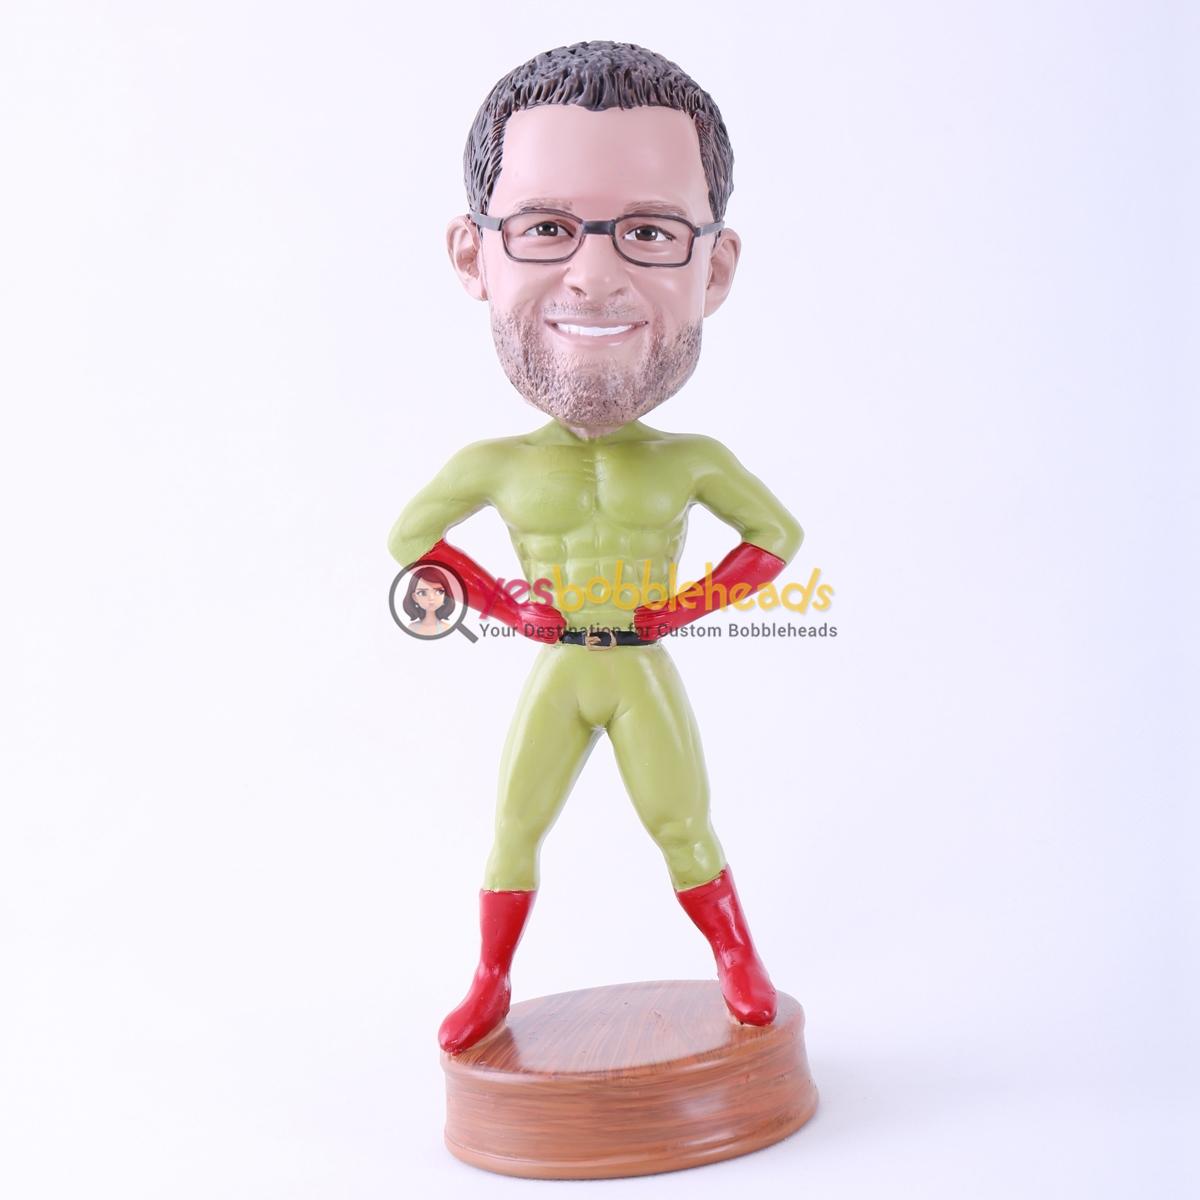 Picture of Custom Bobblehead Doll: Green Skin Superman